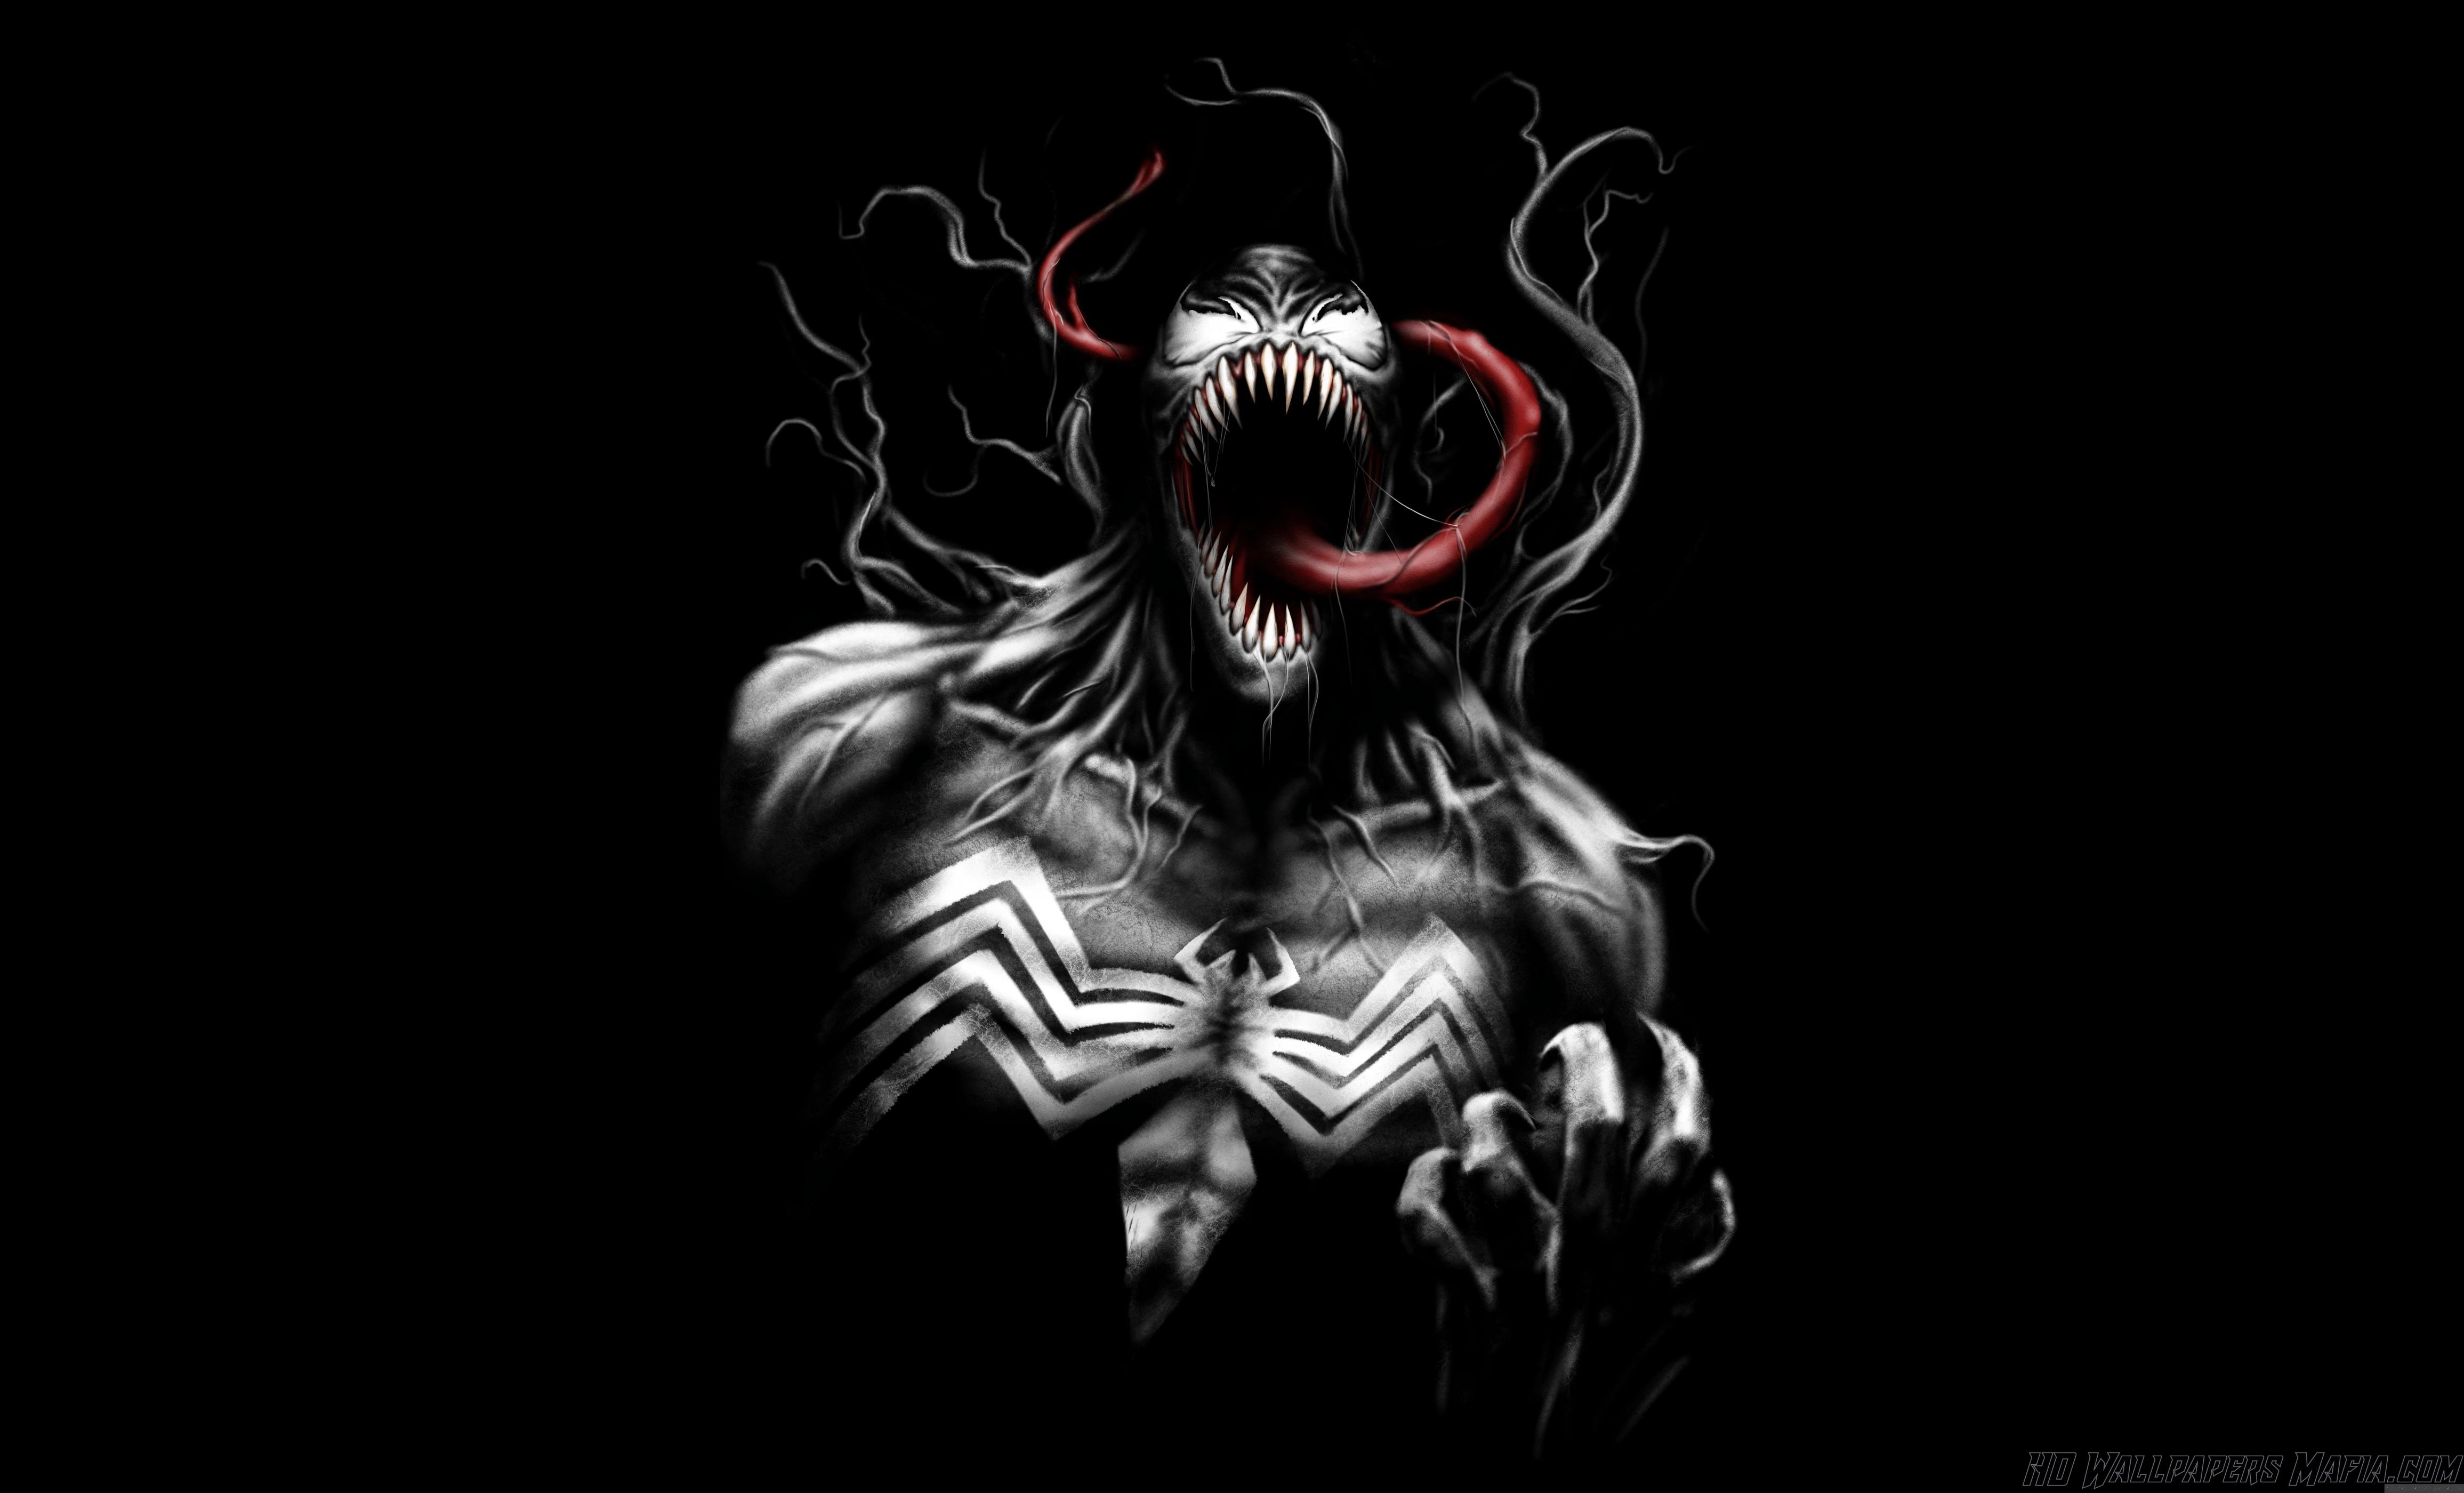 Venom 4k Digital Arts Venom Wallpapers Supervillain Wallpapers Superheroes Wallpapers Hd Wallpapers Di Superhero Spiderman Artwork Iphone Wallpaper Hipster